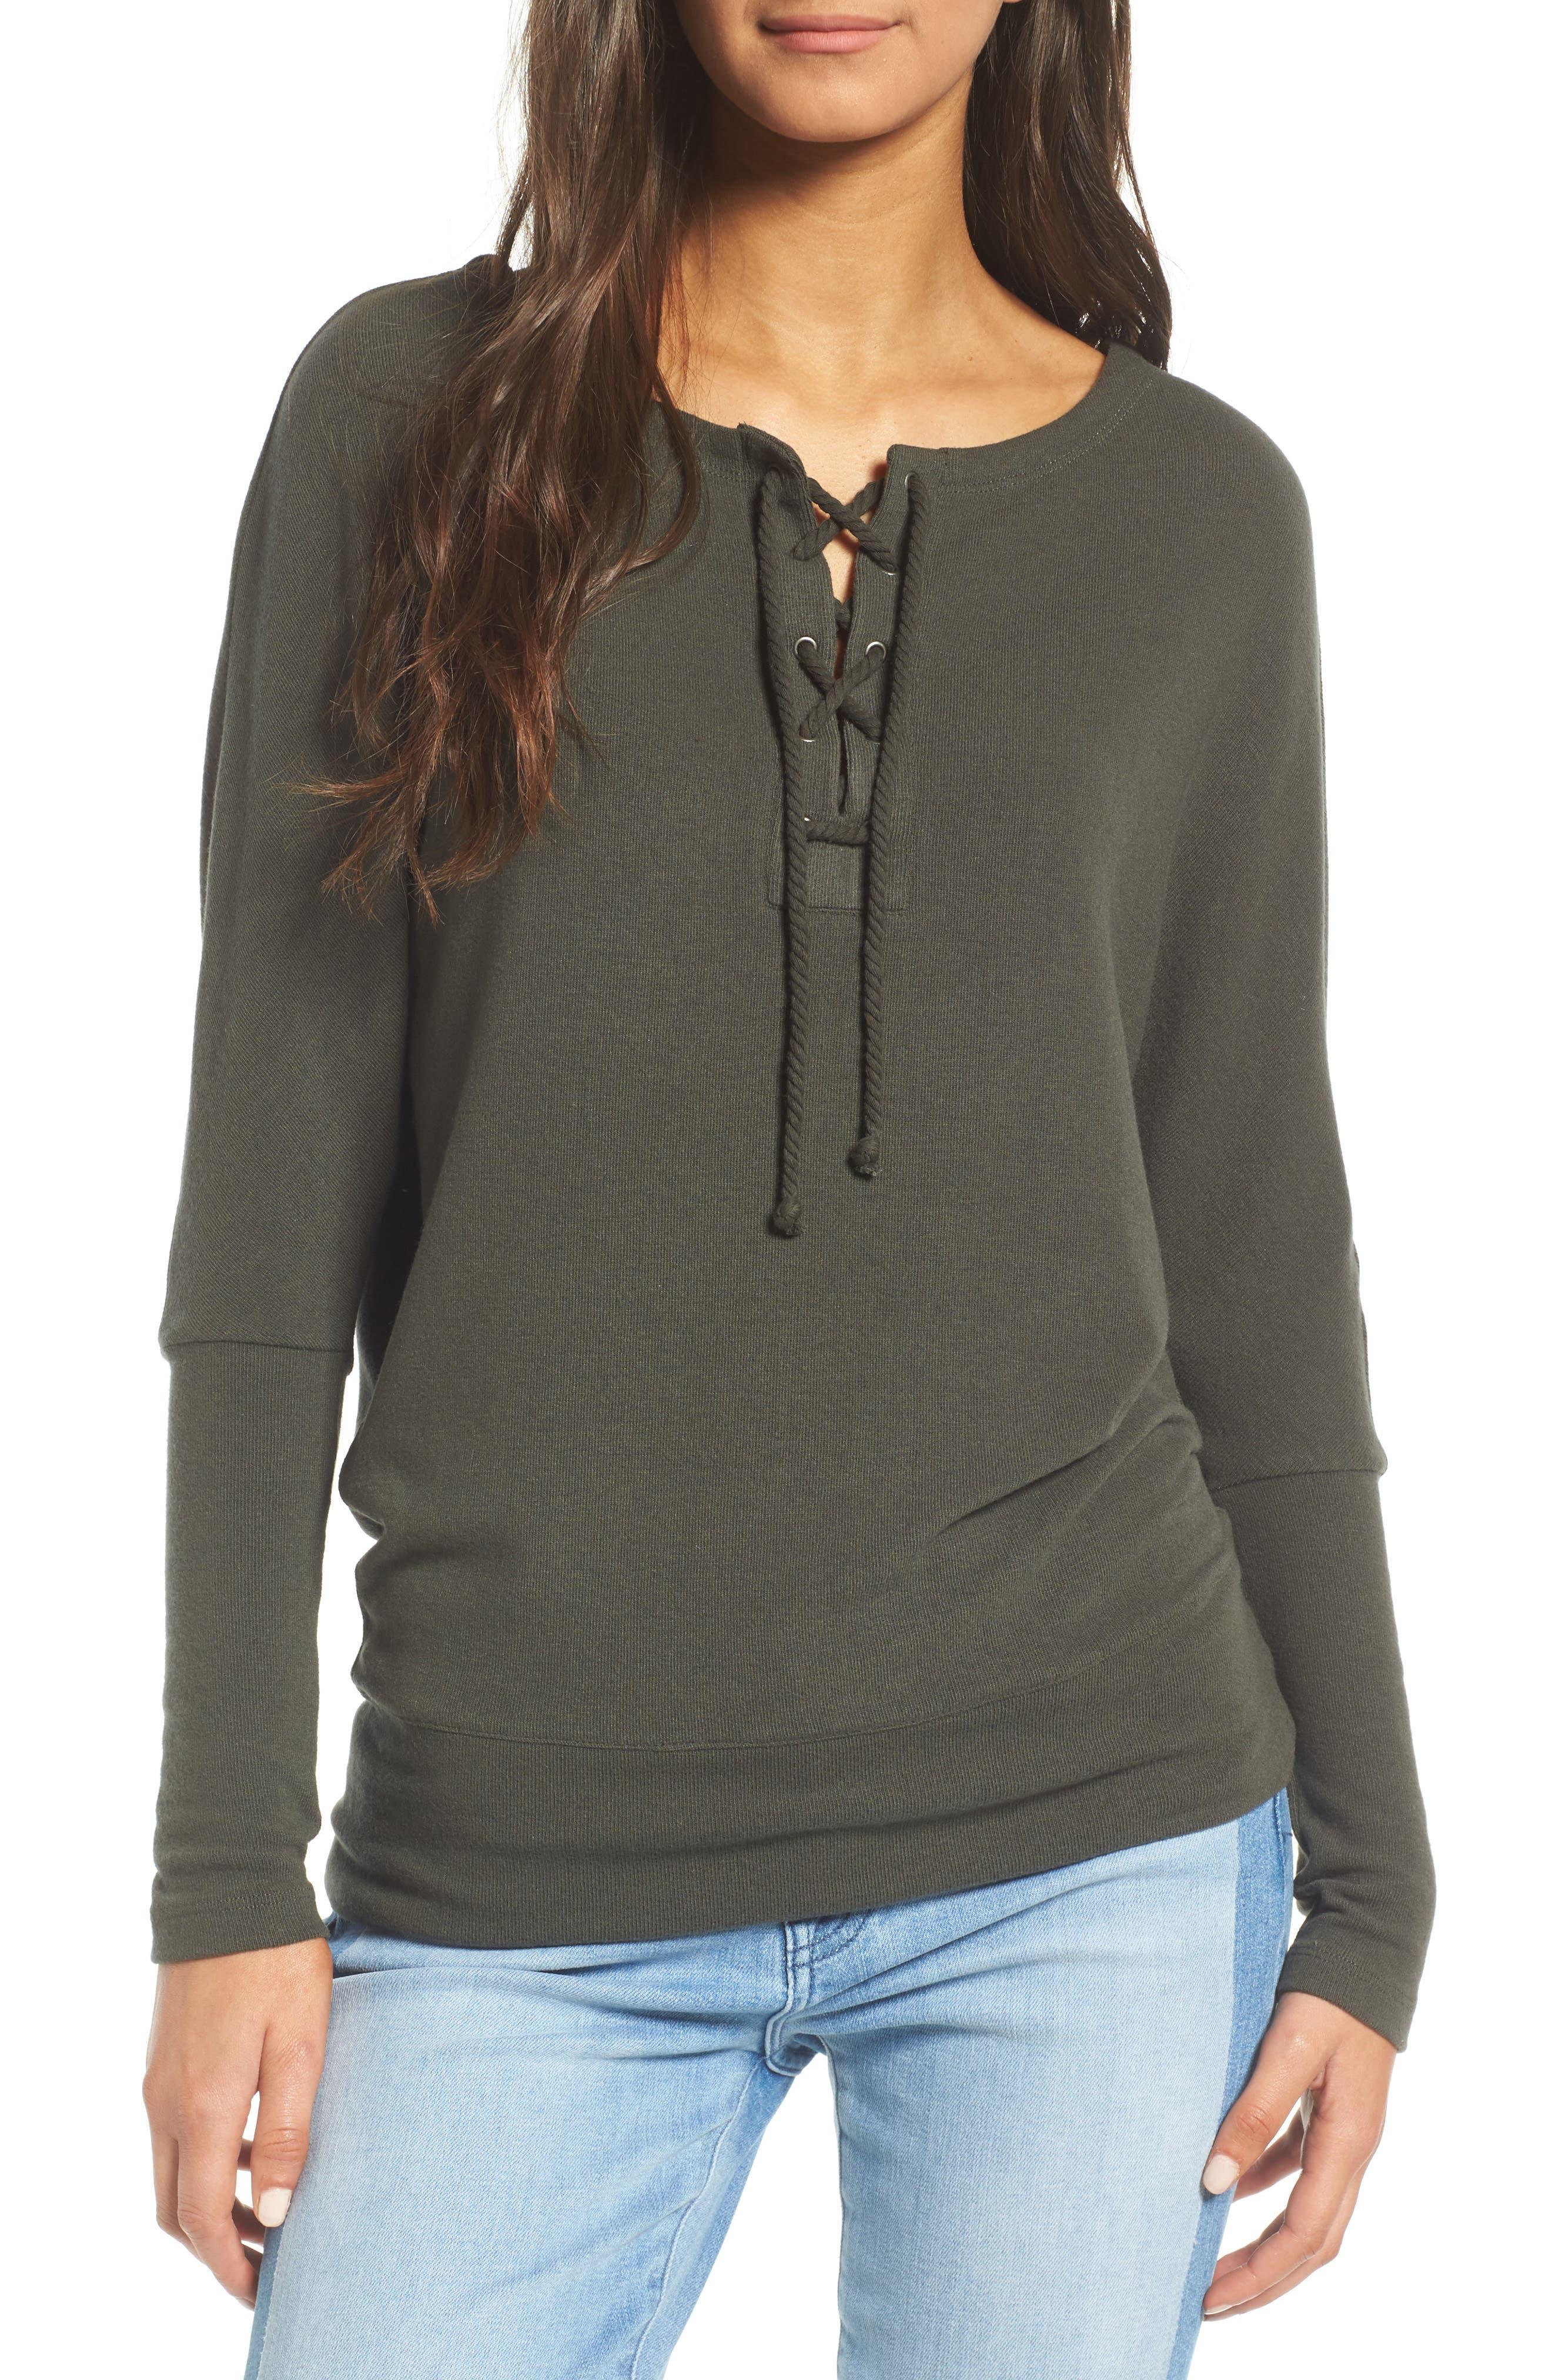 Main Image - cupcakes and cashmere Danton Lace-Up Sweatshirt